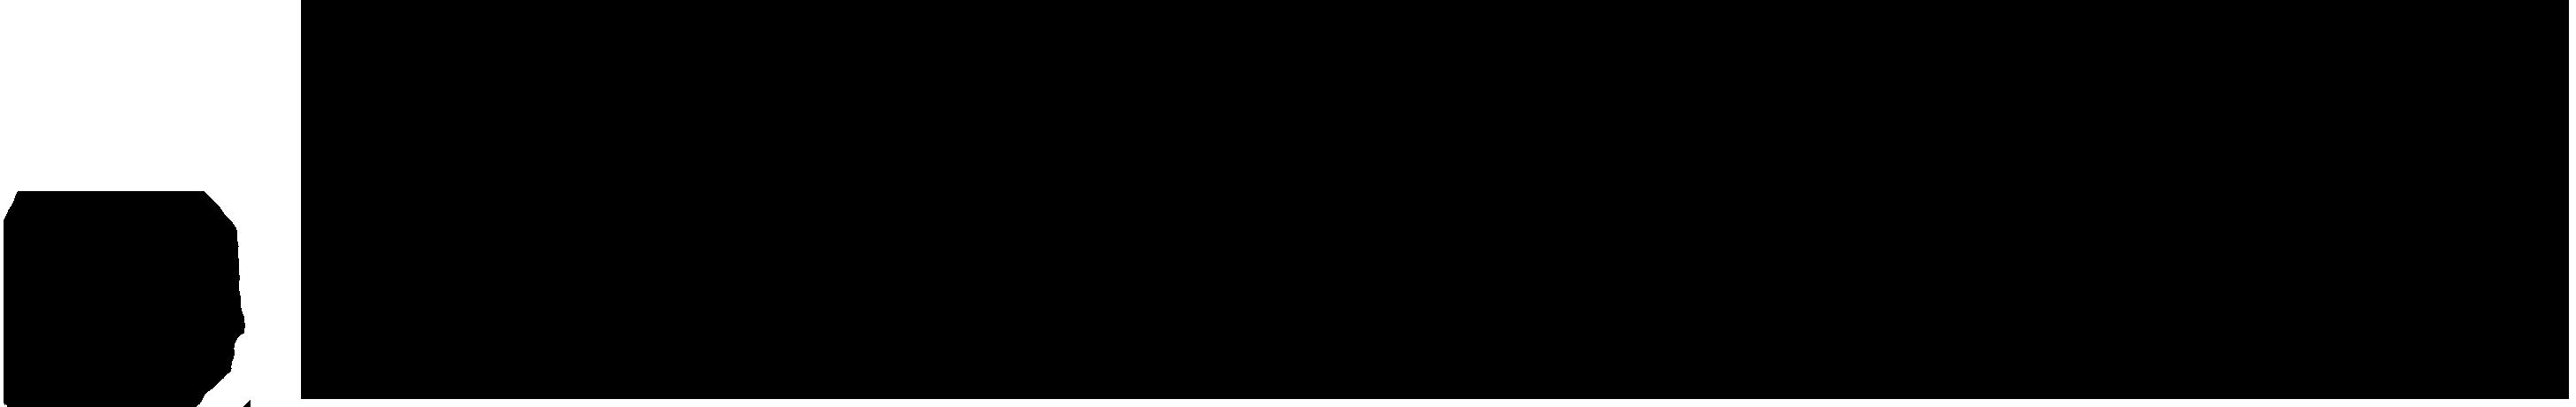 DotMusic_Logo_3_26_2019_Black_DotMusic_Heavy_Font (2)